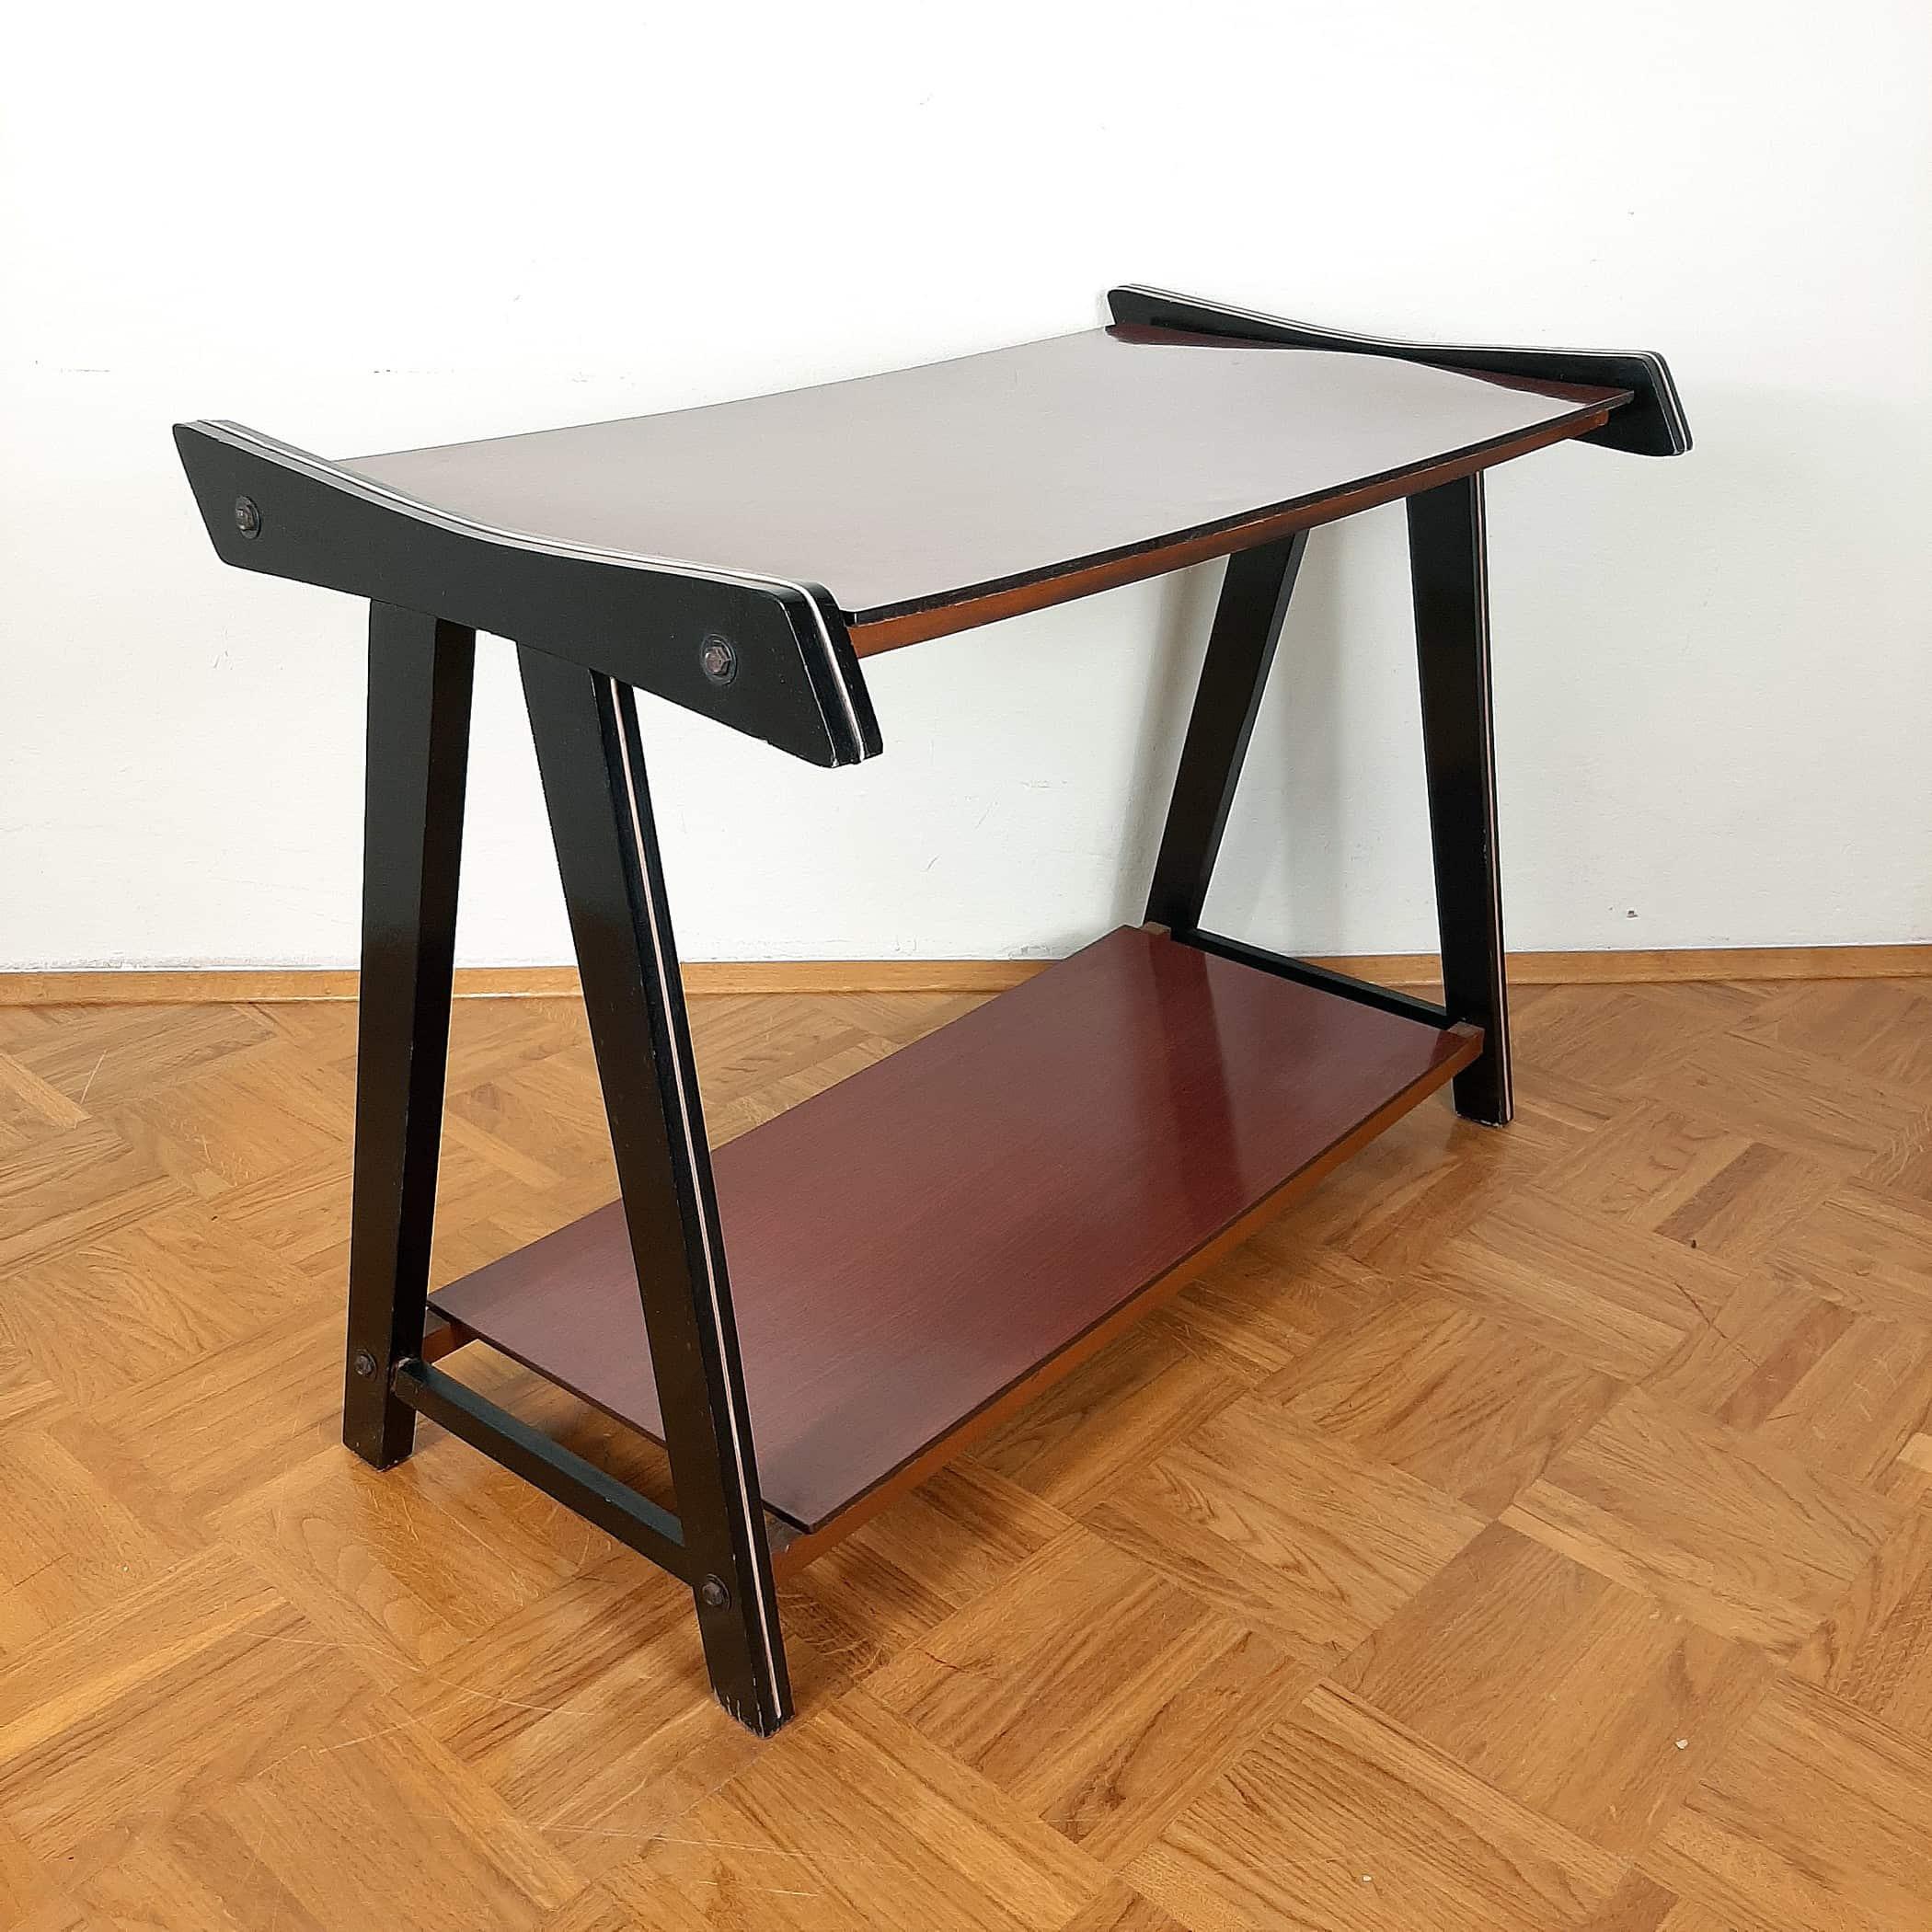 Mid-century tv or radio console table Yugoslavia 1970 mid-century desk red Black table Retro furniture